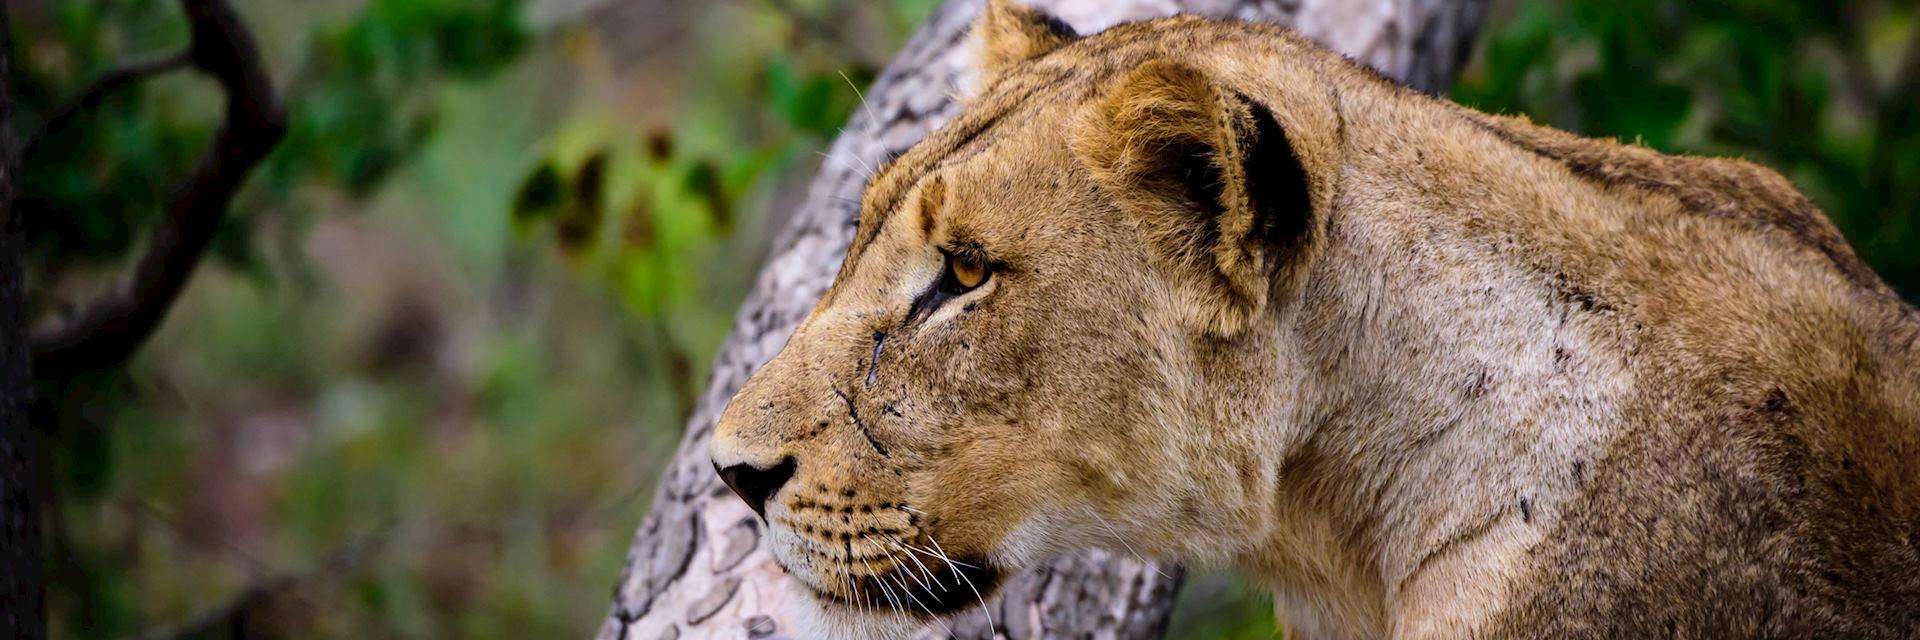 Lioness, Sabi Sands Wildtuin